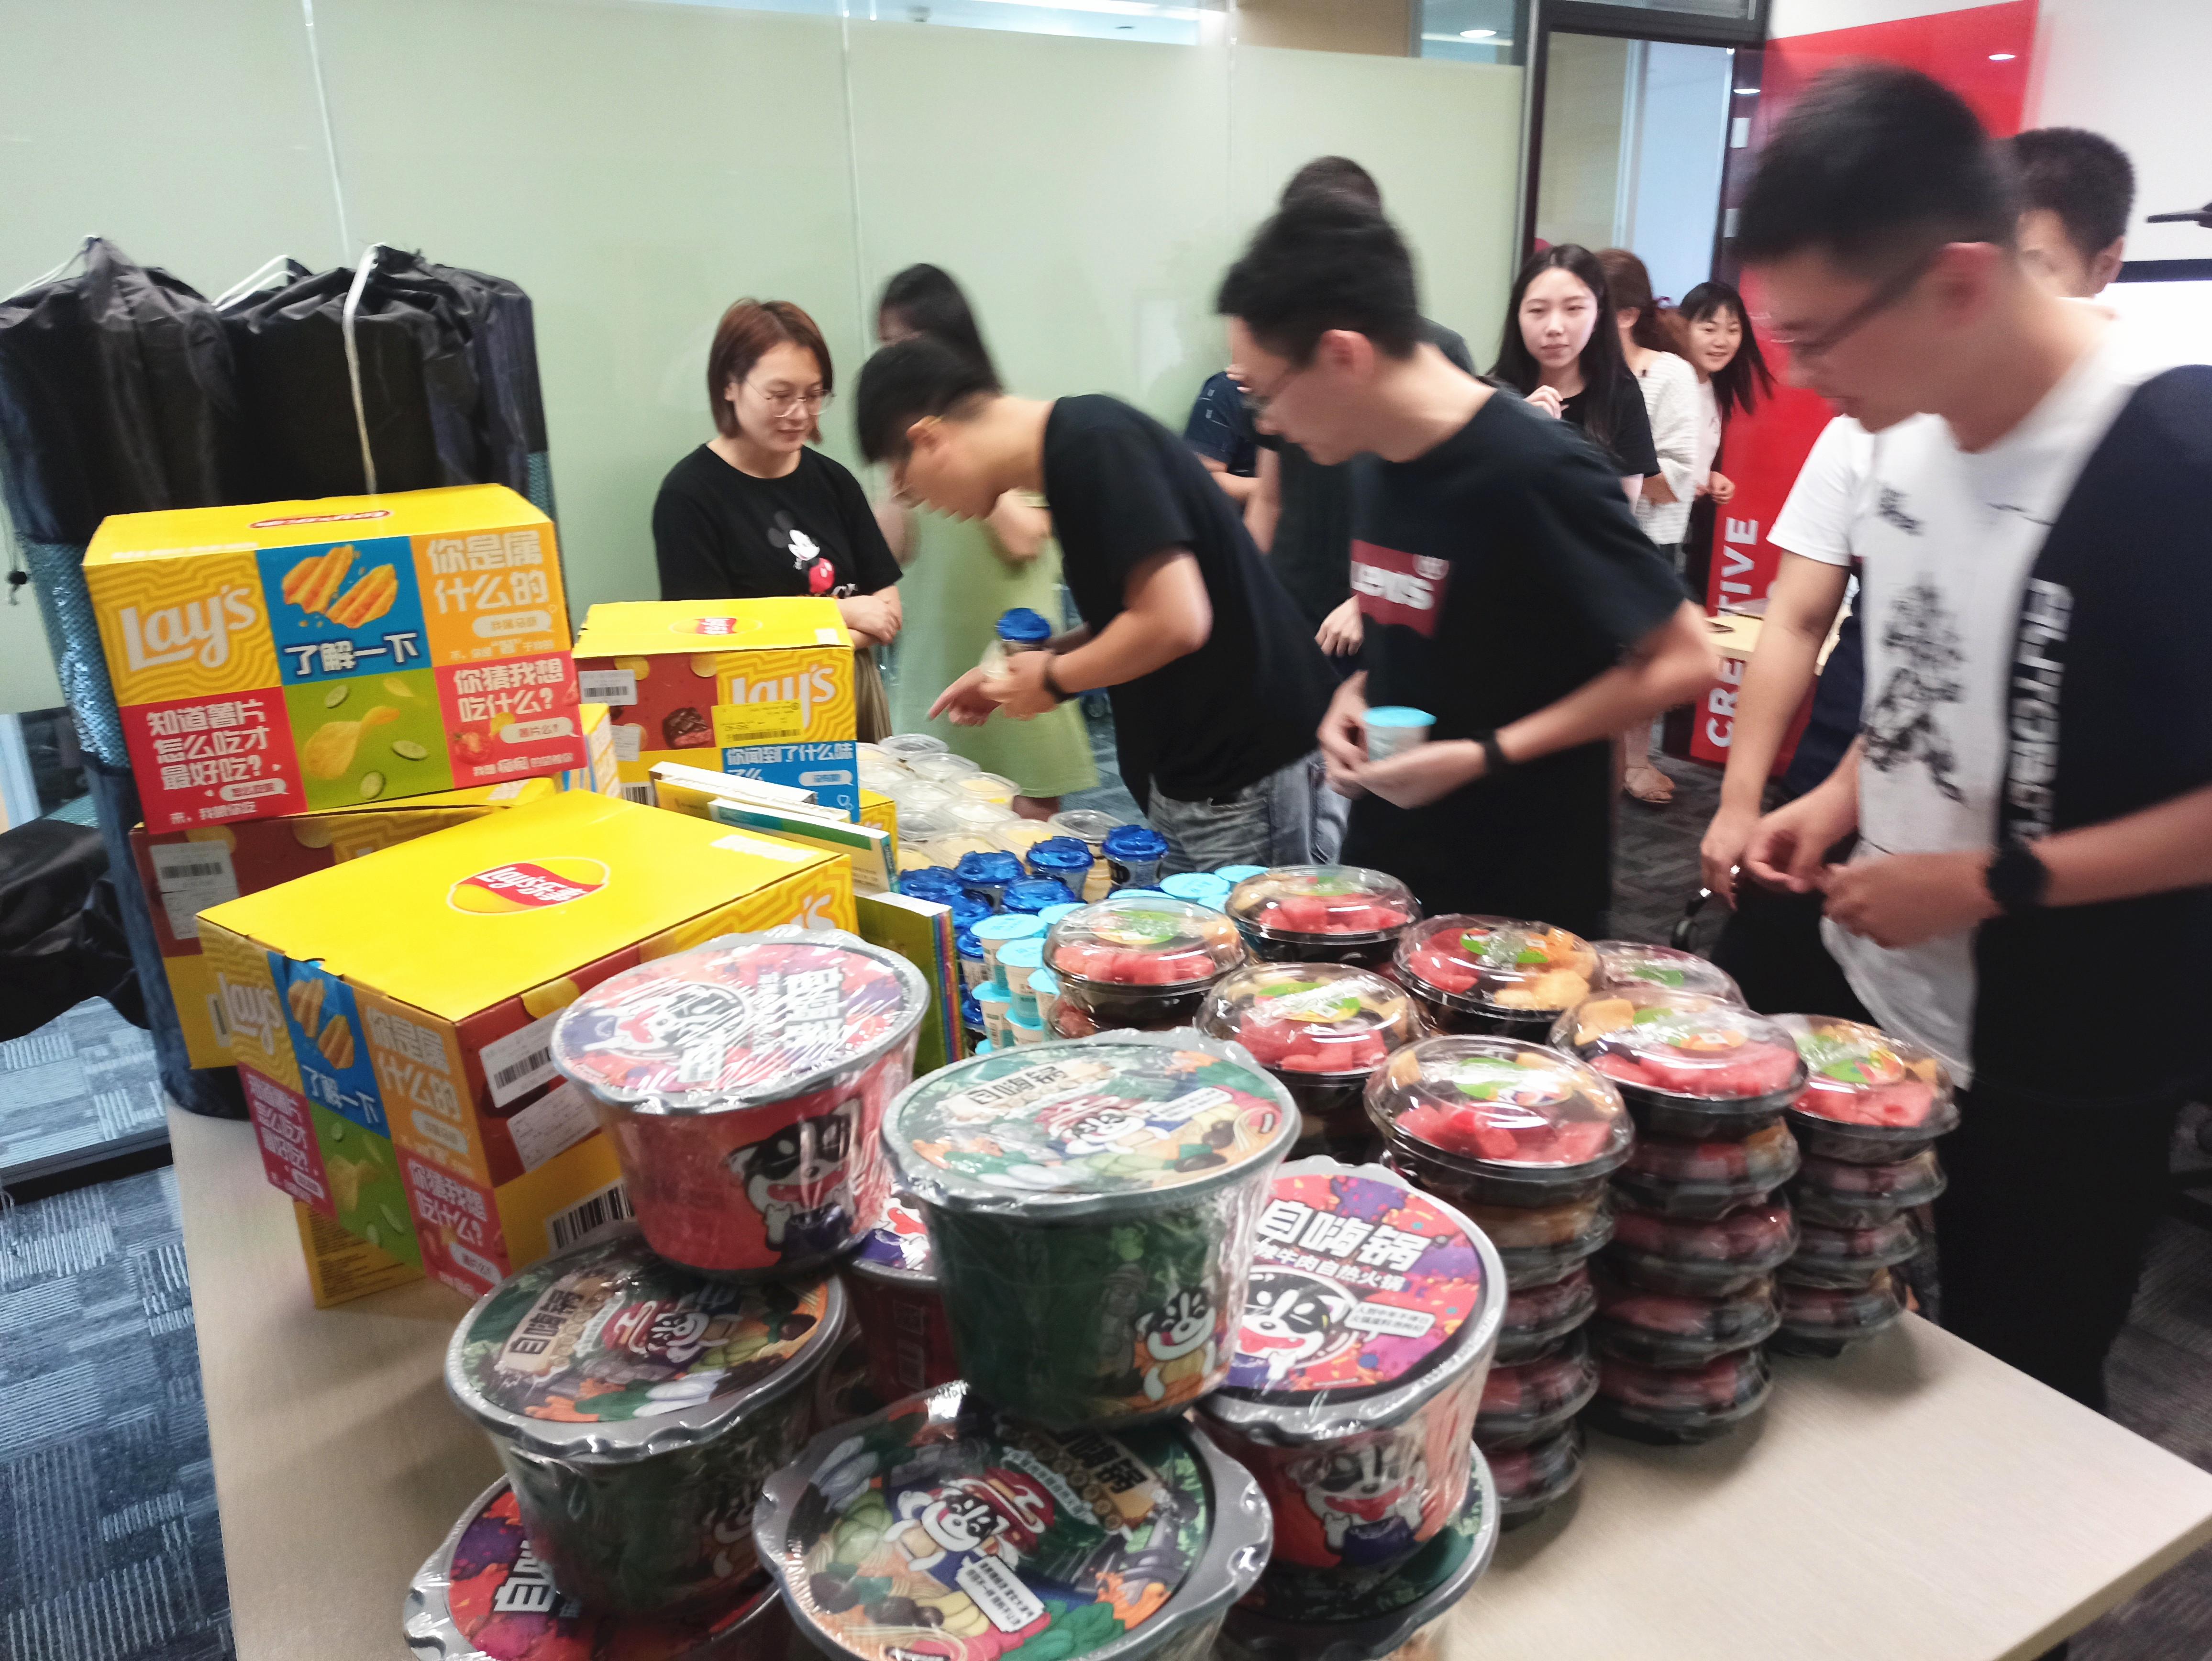 CI&T China employees grabbing food